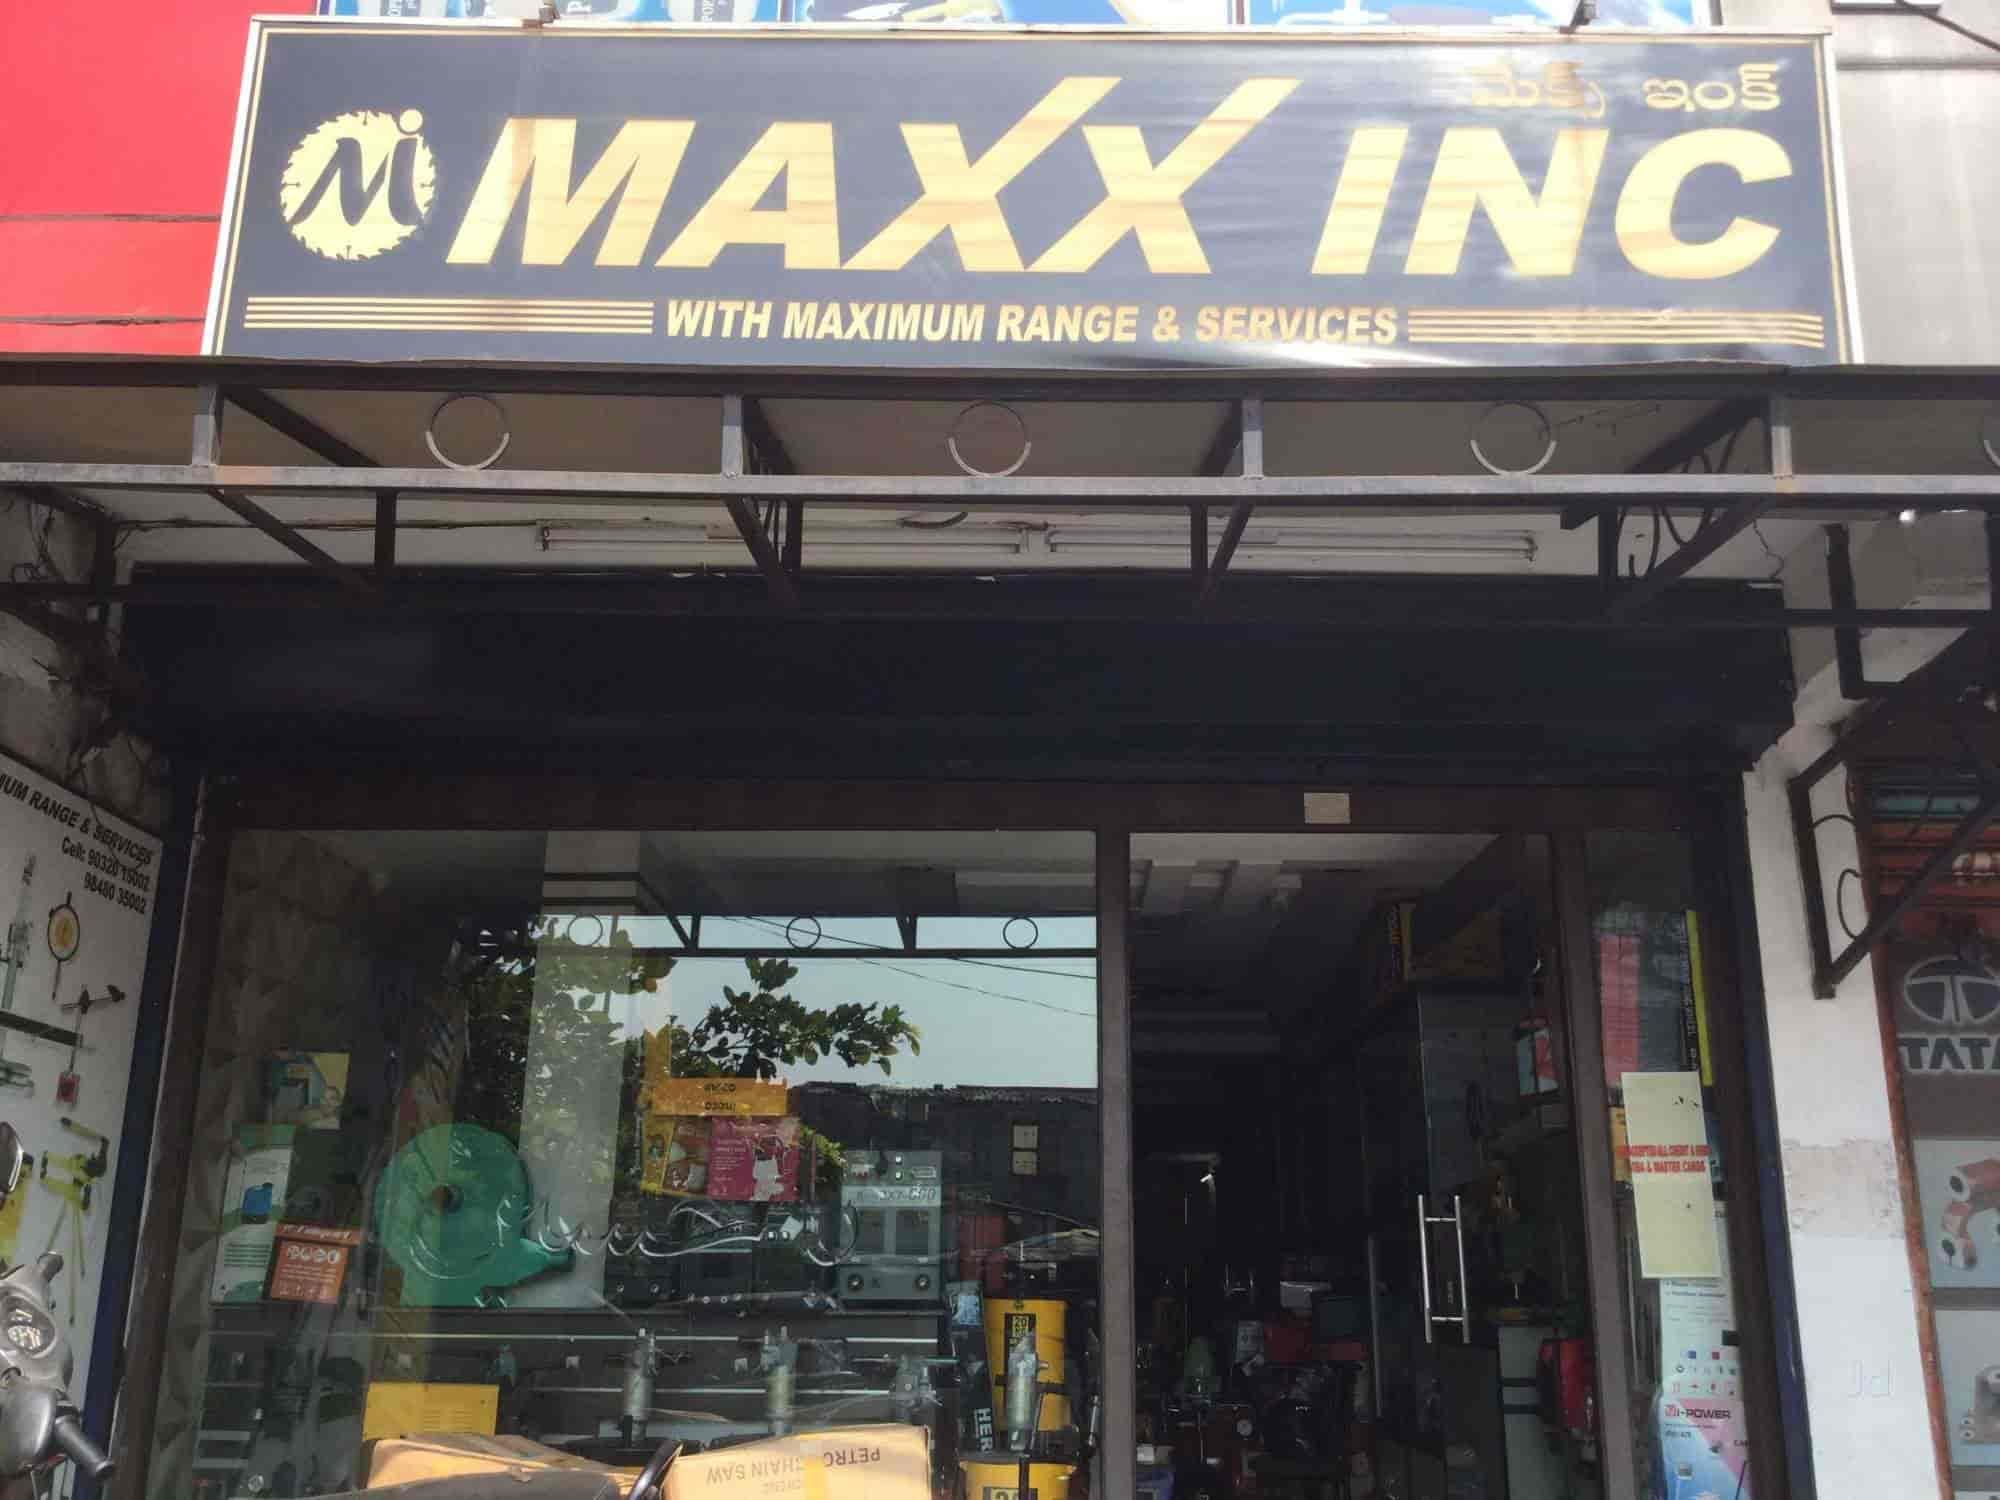 Maxx Inc, Poorna Market - Hardware Shops in Visakhapatnam - Justdial